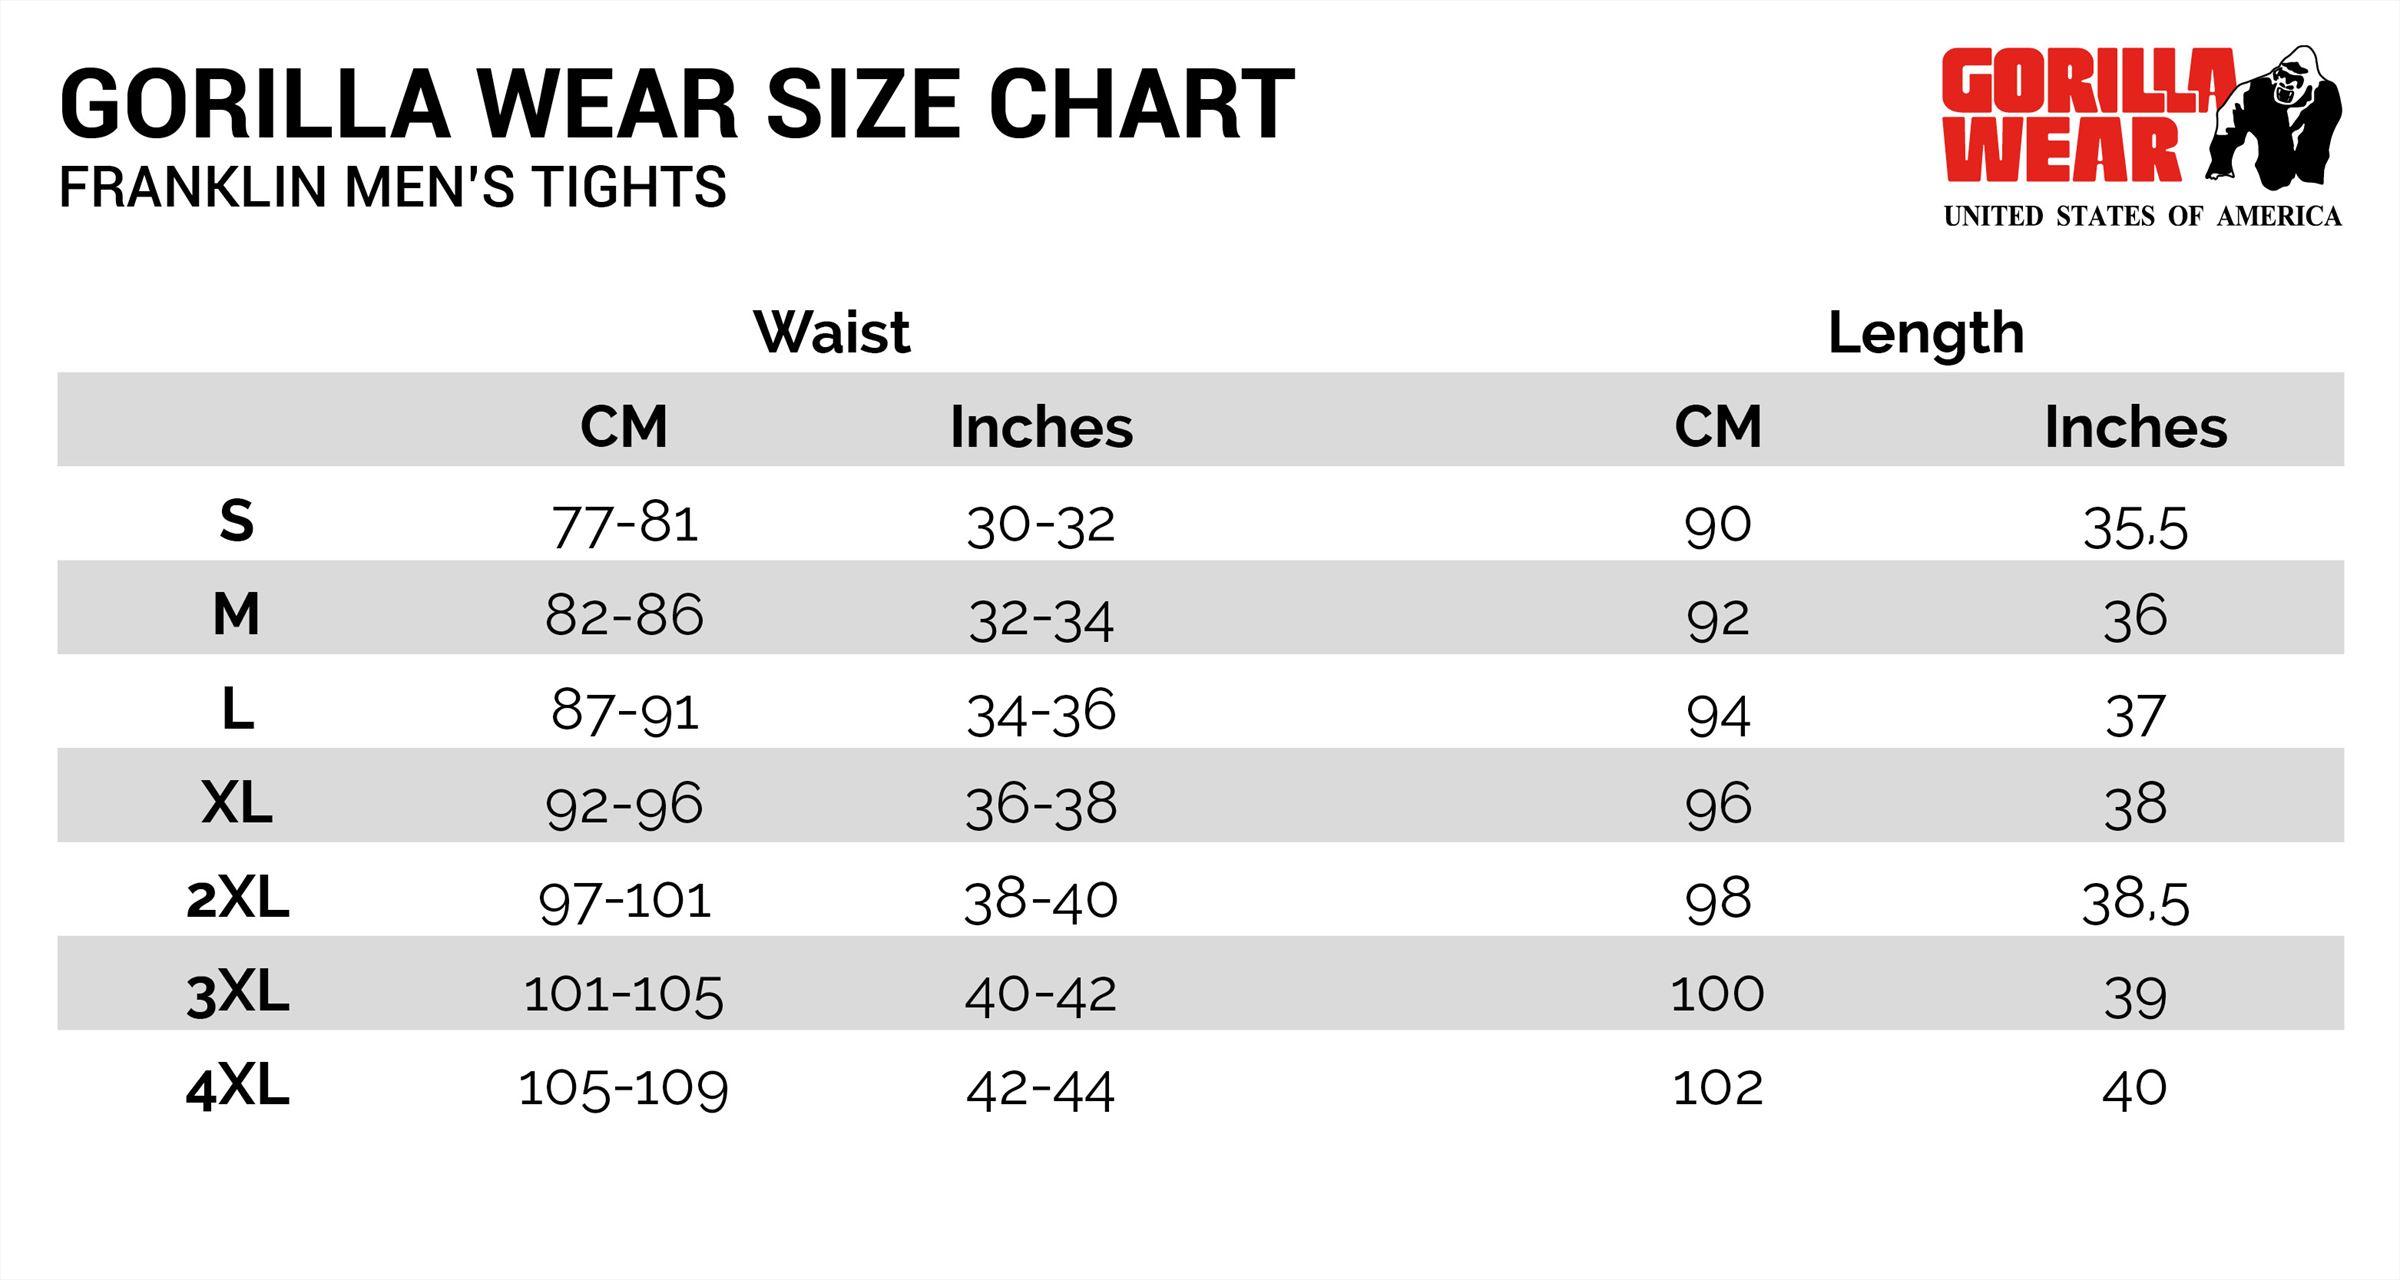 a136bd655bfa0 Franklin Heren Tights - Zwart/Grijs Camo Gorilla Wear